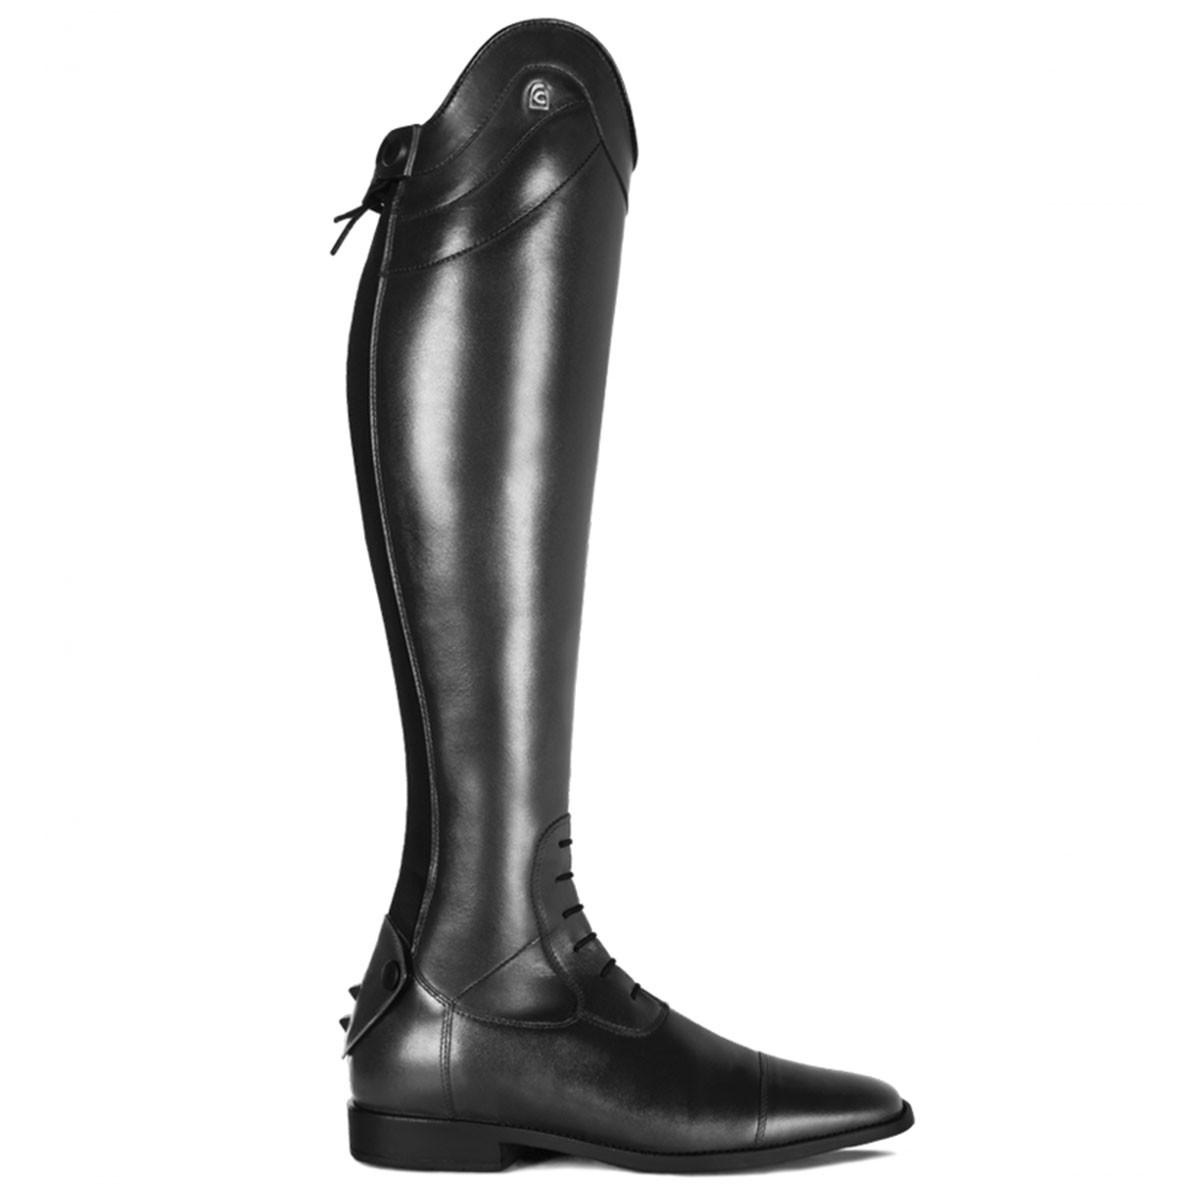 Cavallo Linus Slim rijlaars zwart maat:6-6.5 / h47-w33